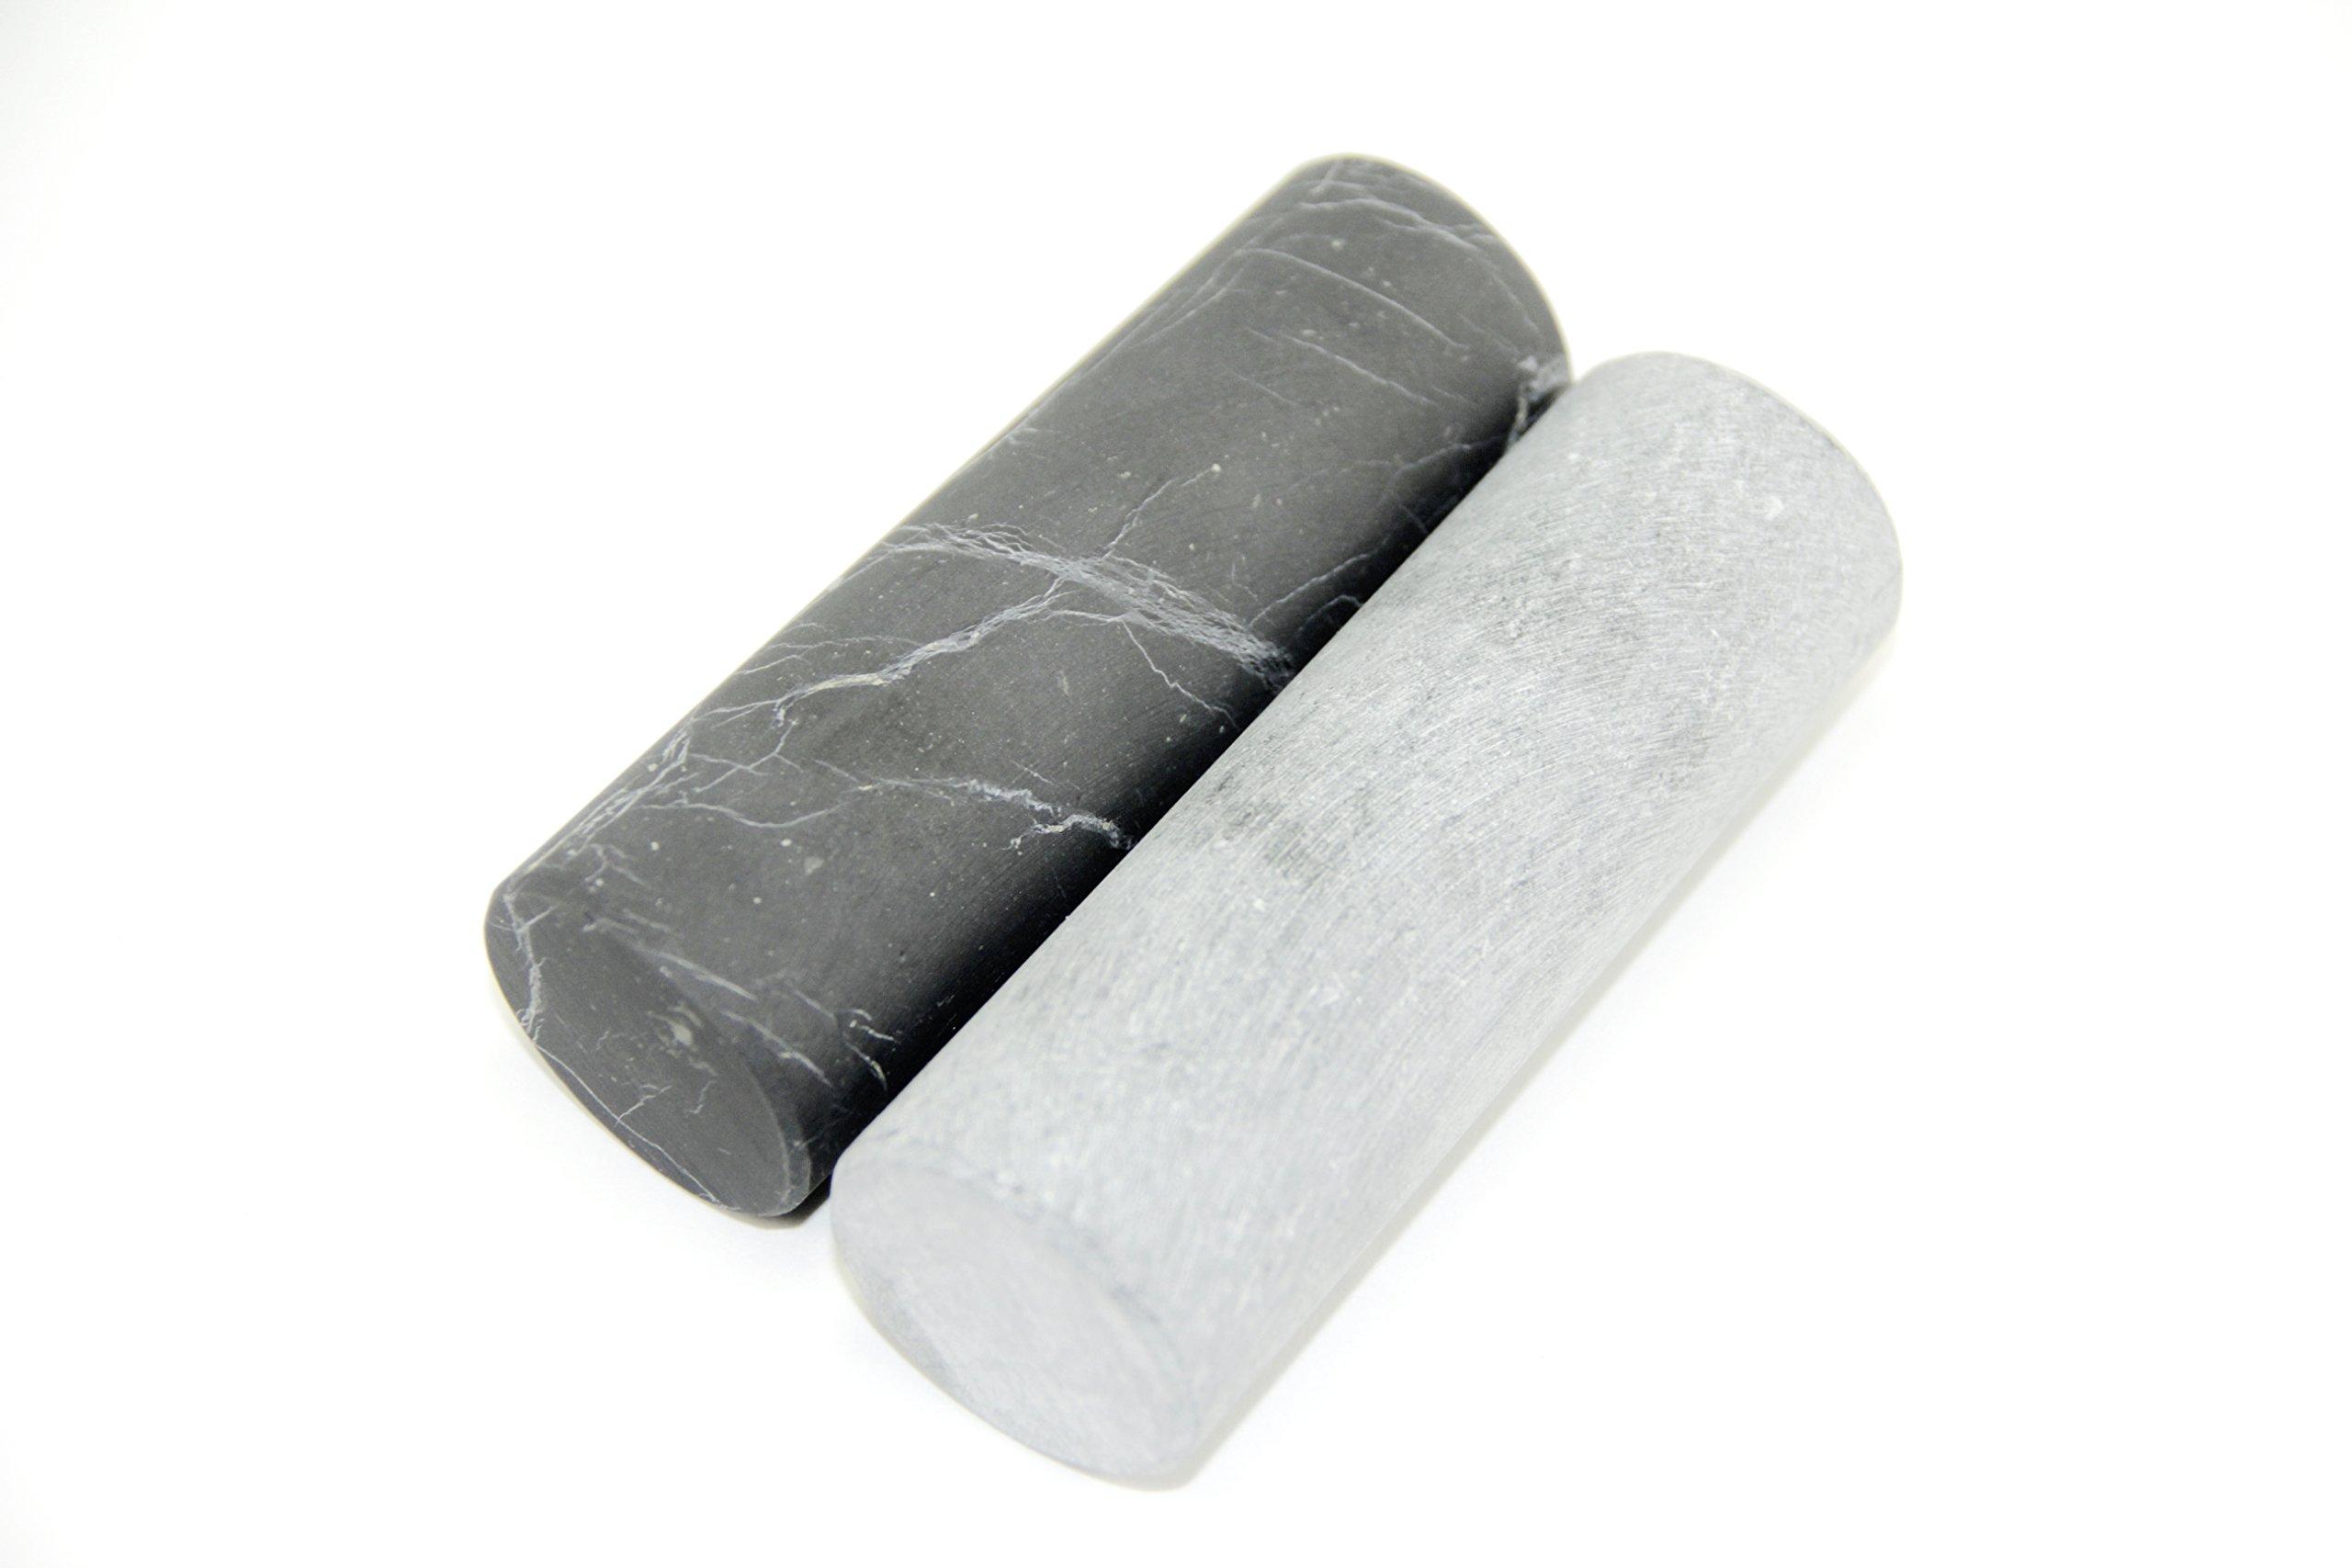 Unpolished Shungite Crystal Pharaoh Cylinders - 100% natural unpolished gemstone - Russia Stone - Gem - Semi precious Mineral - Reiki, Meditation, Crystal Healing - Alien Stone